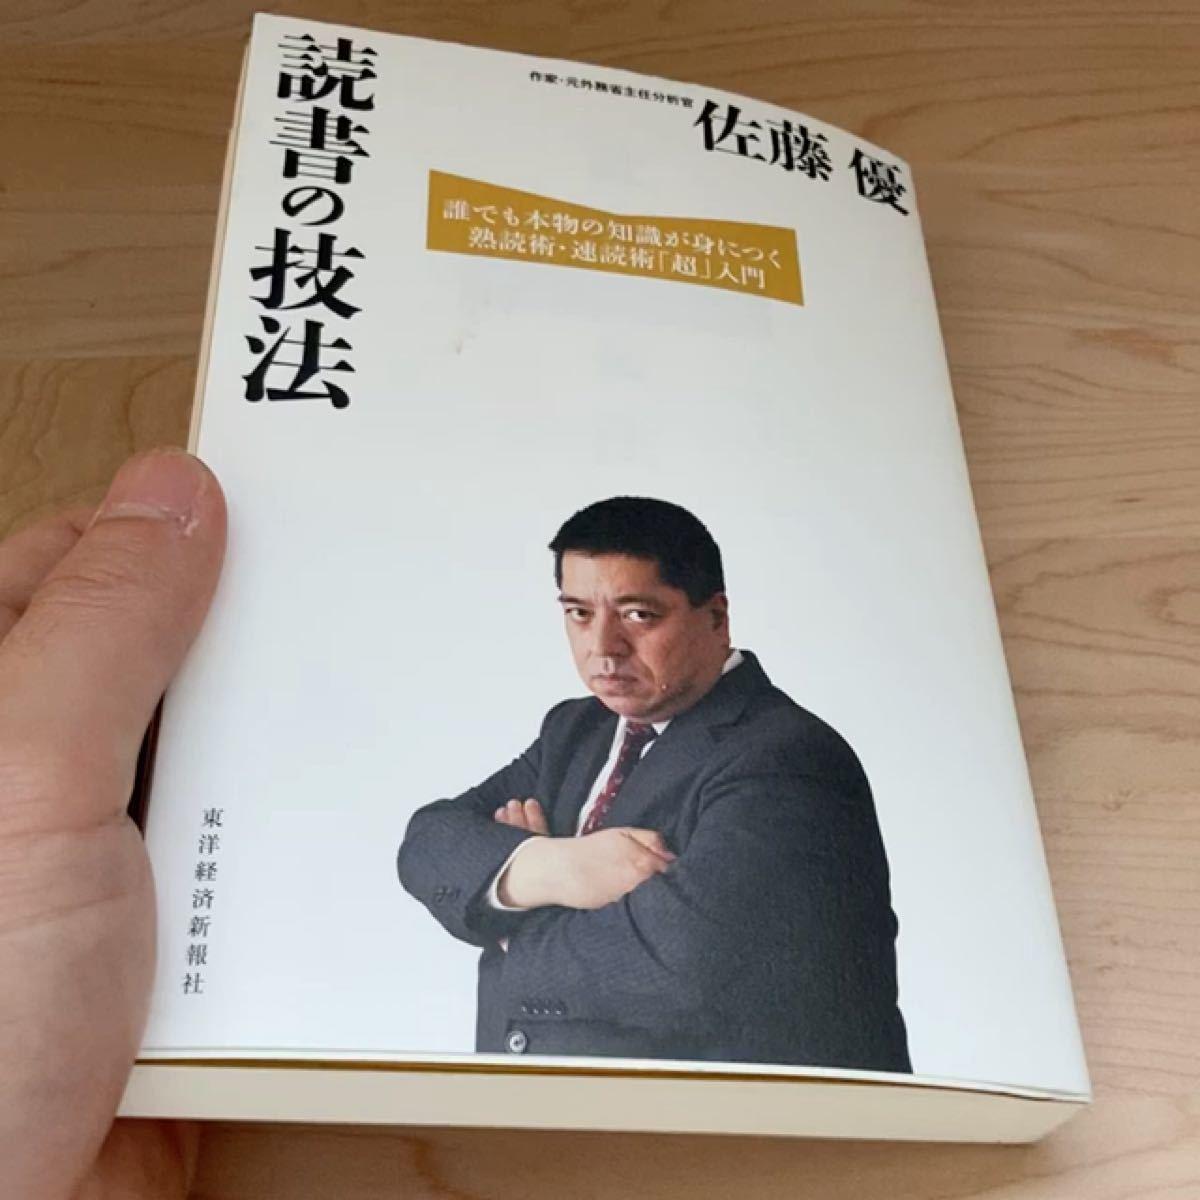 読書の技法 佐藤優